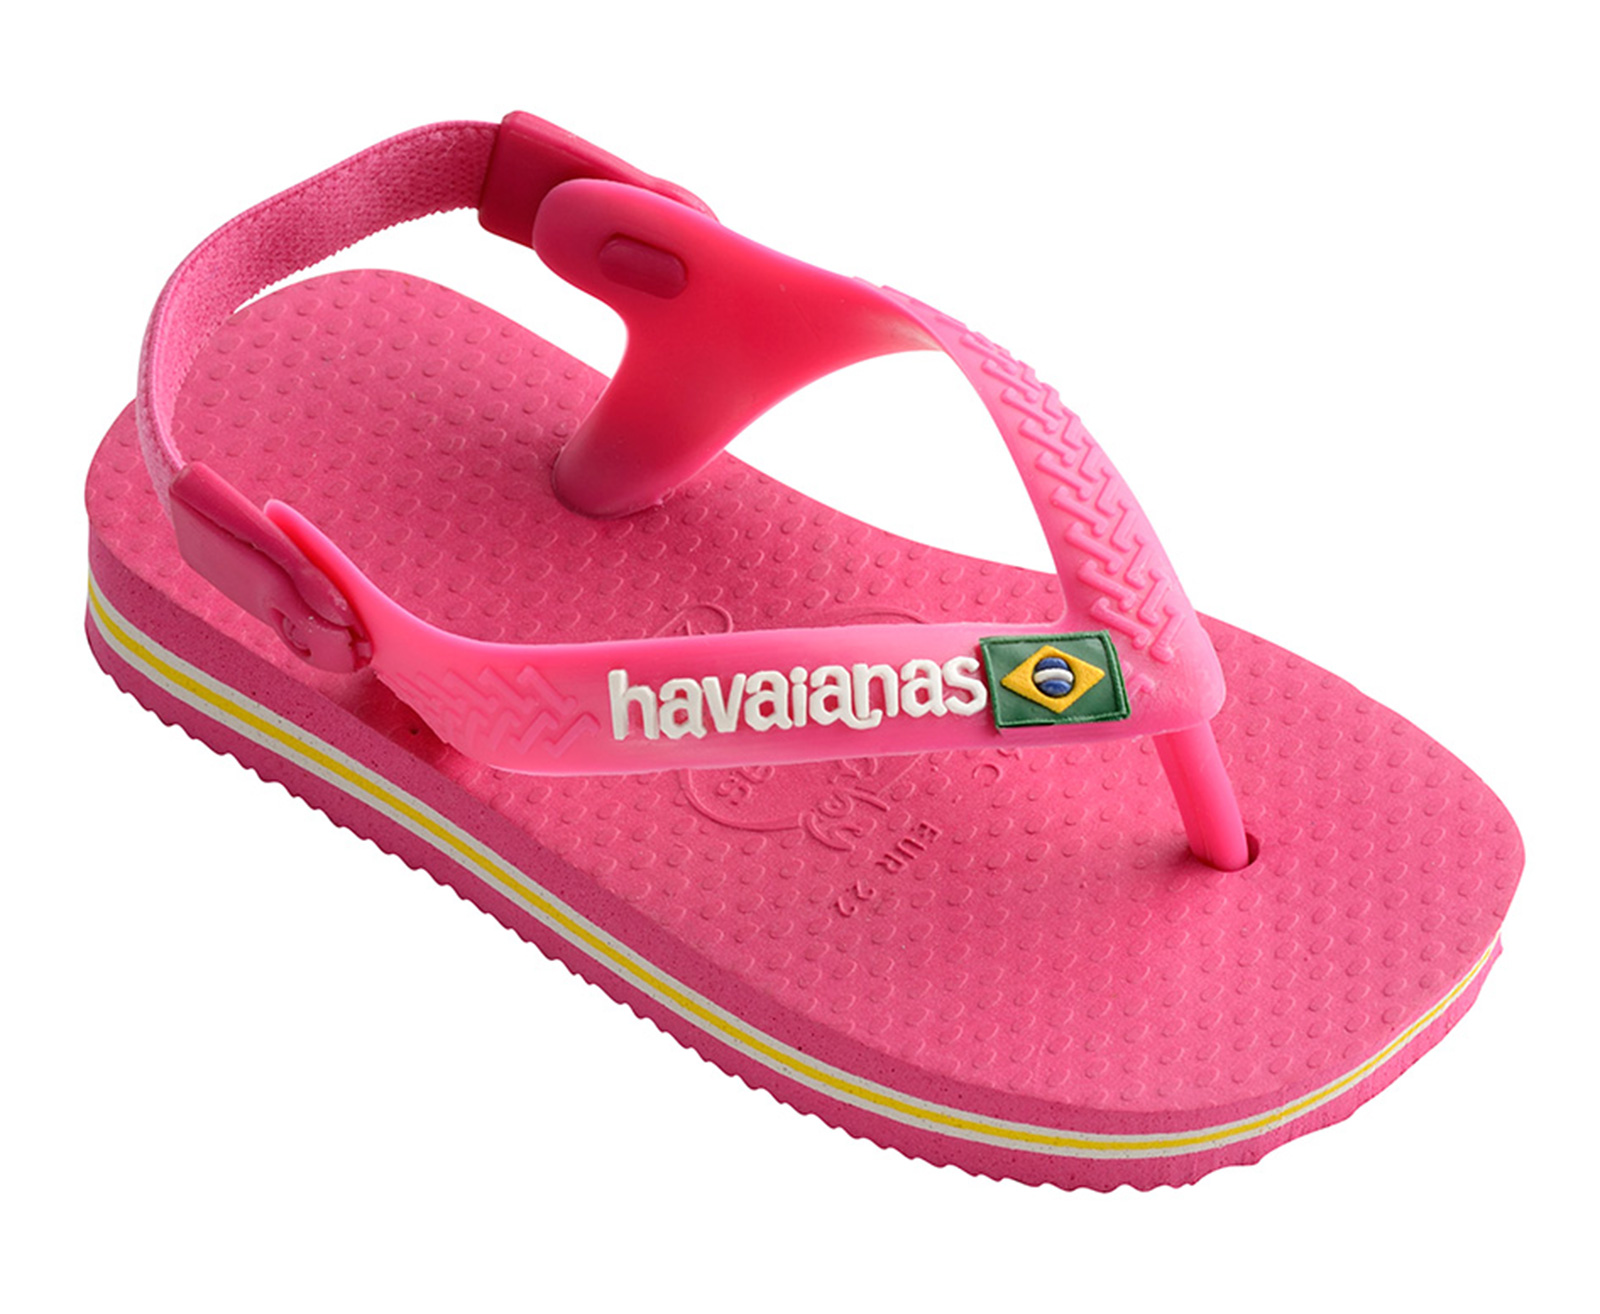 Sandals Flip flops Baby Melissa Campana Zig Zag Vi Pink